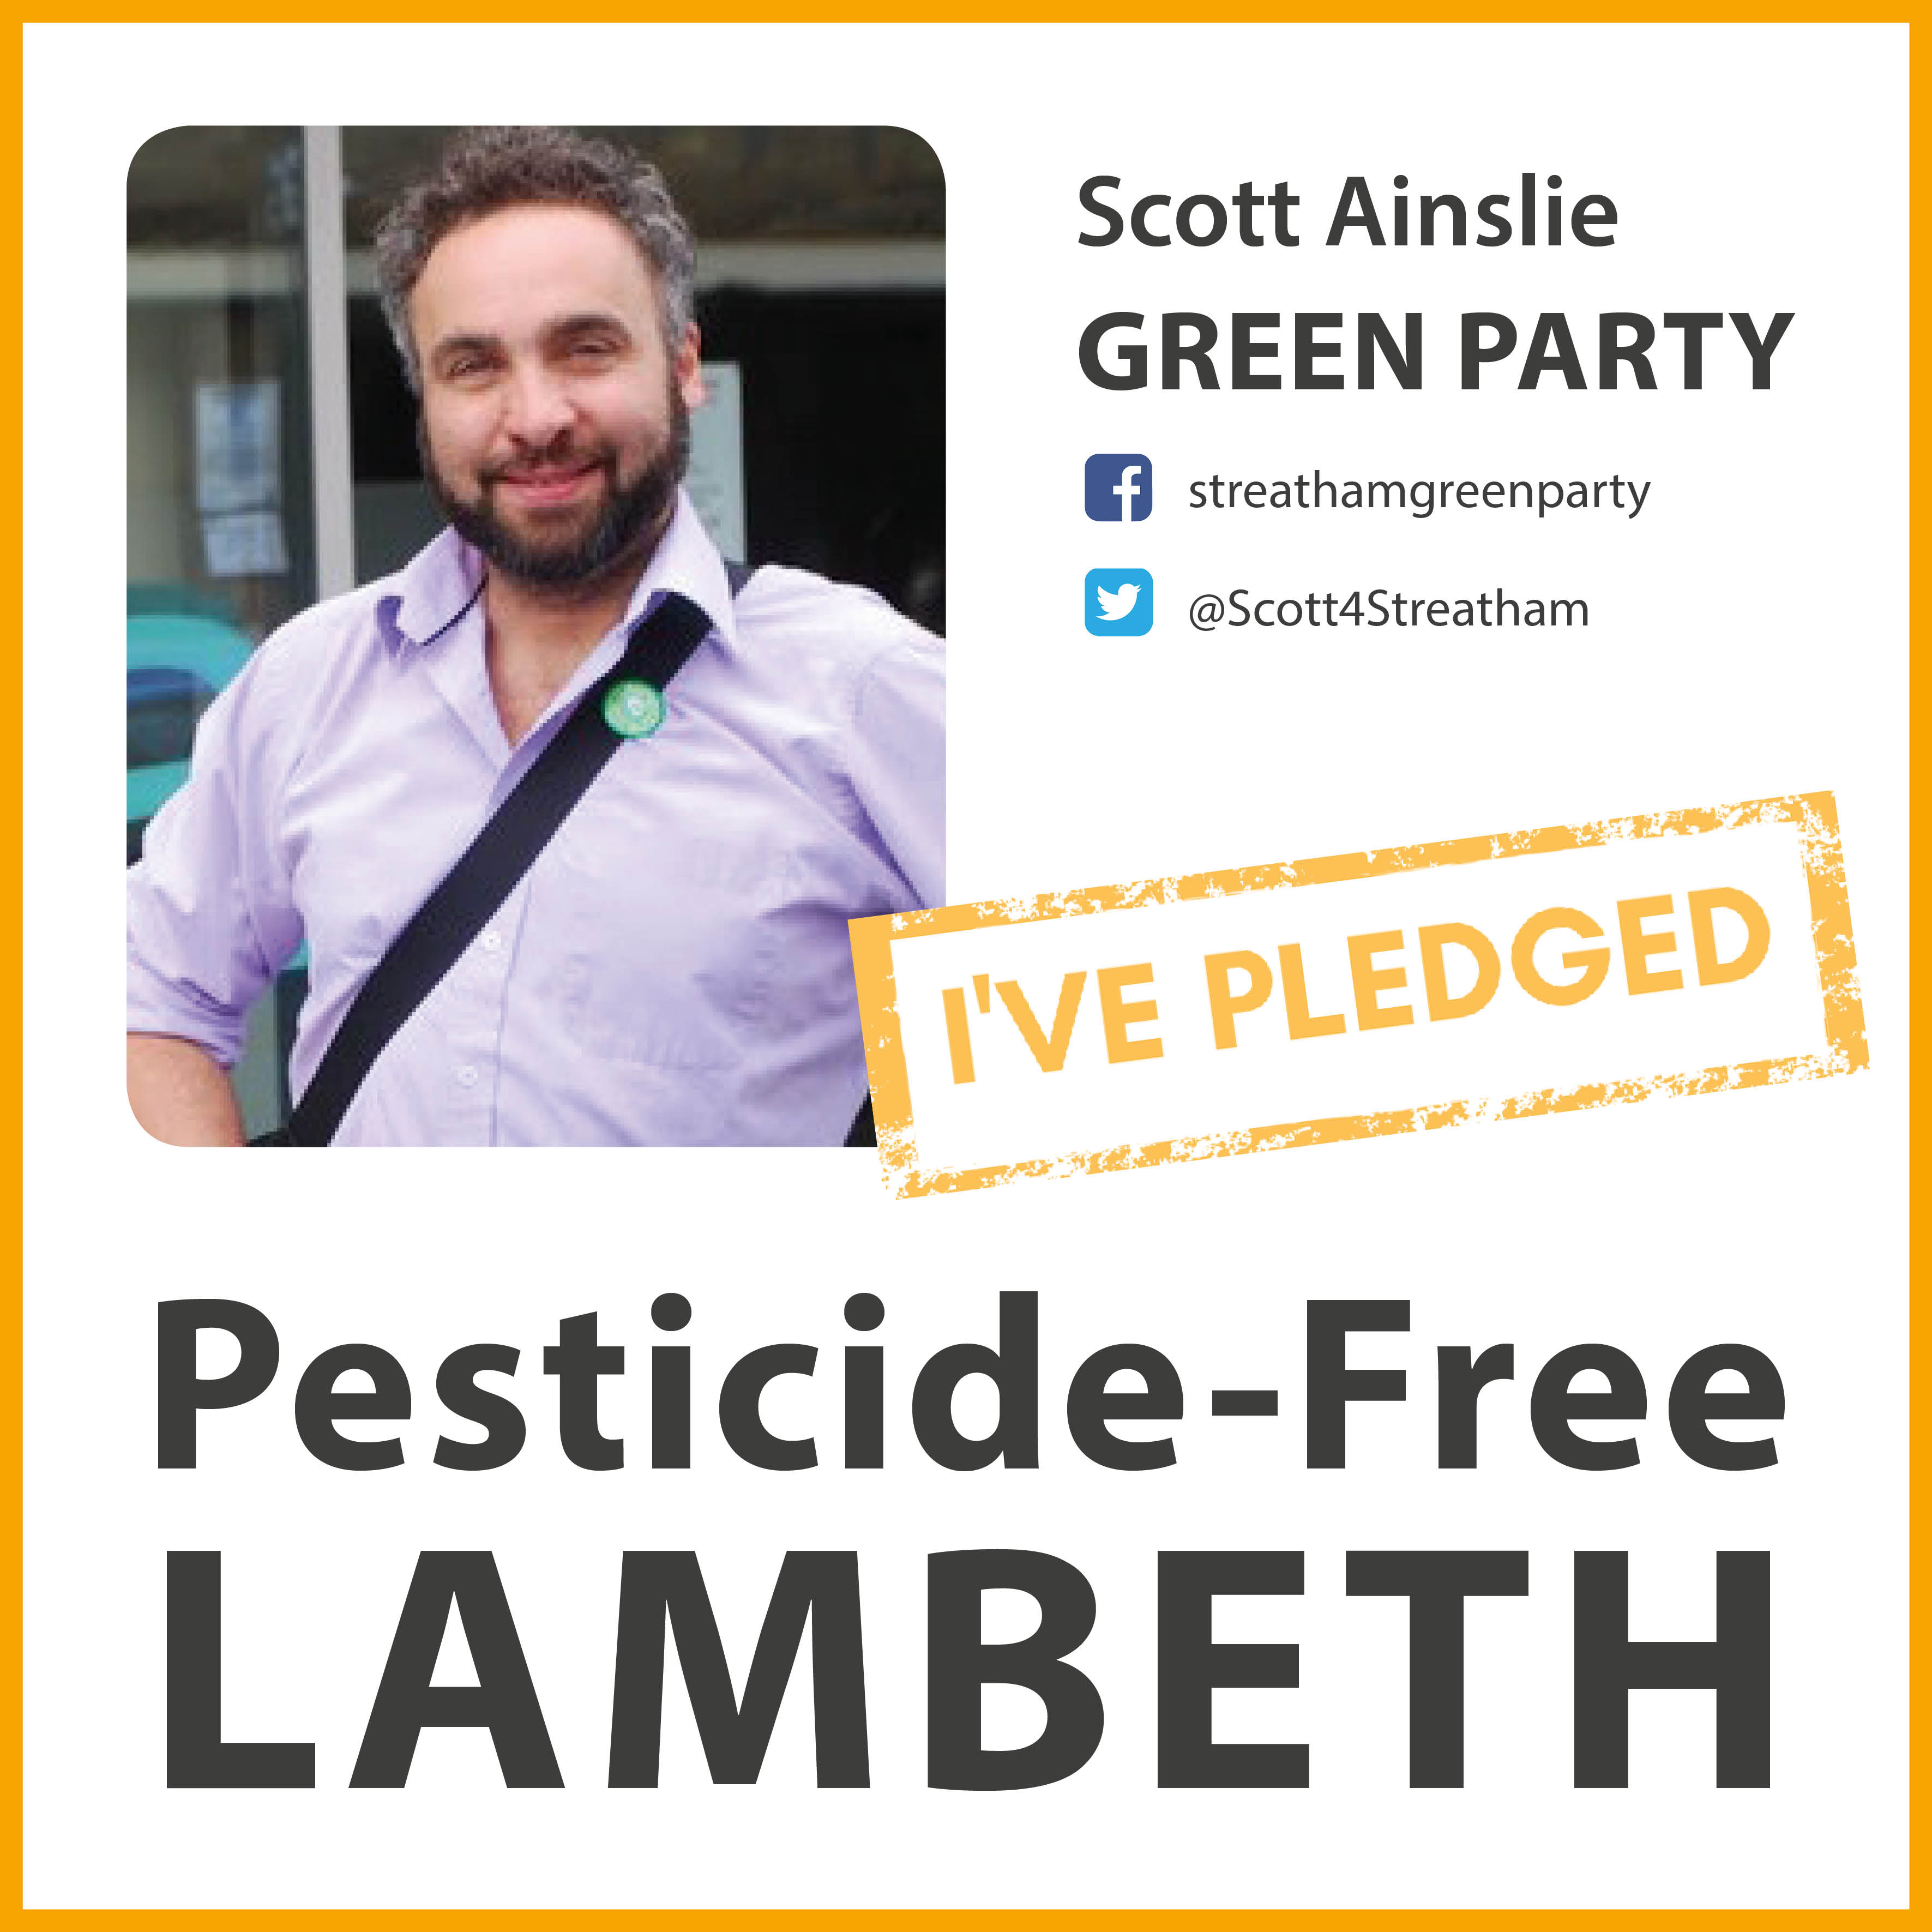 Scott Ainslie has taken the pesticide-free pledge in Lambeth